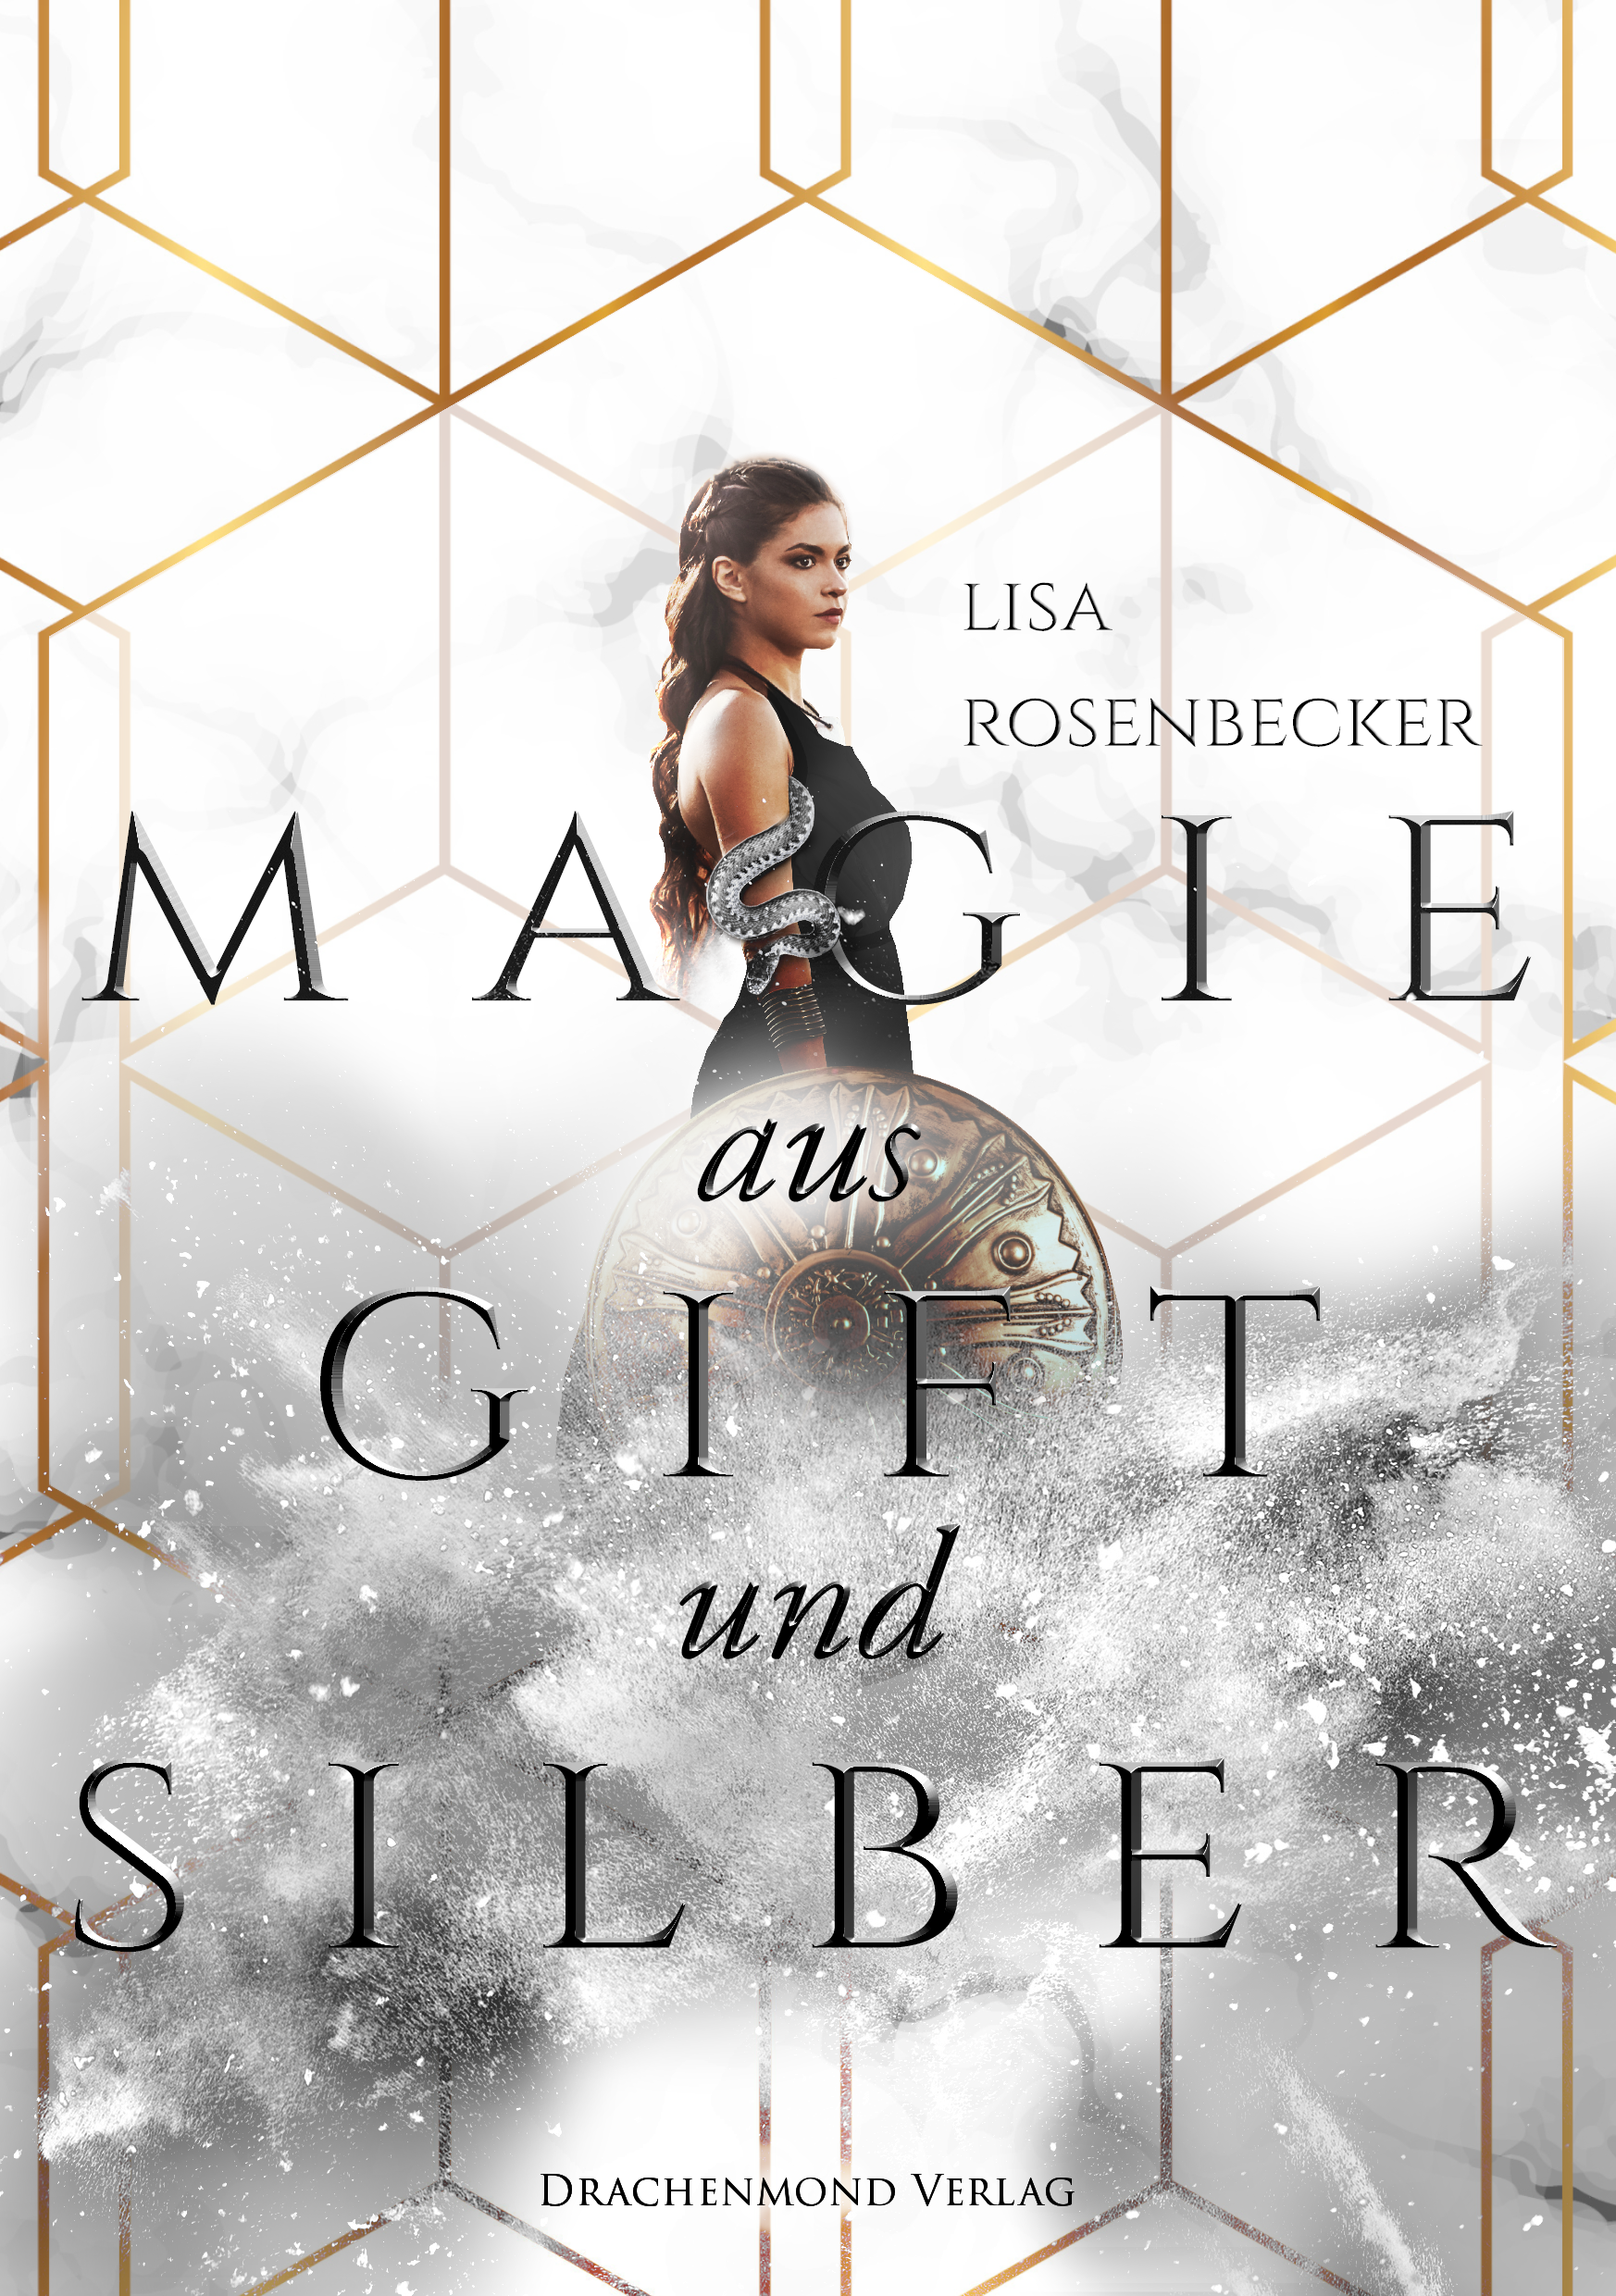 rosenbecker_lisa_magie_aus_gift_und_silber_phantastik-autoren-netzwerk.png